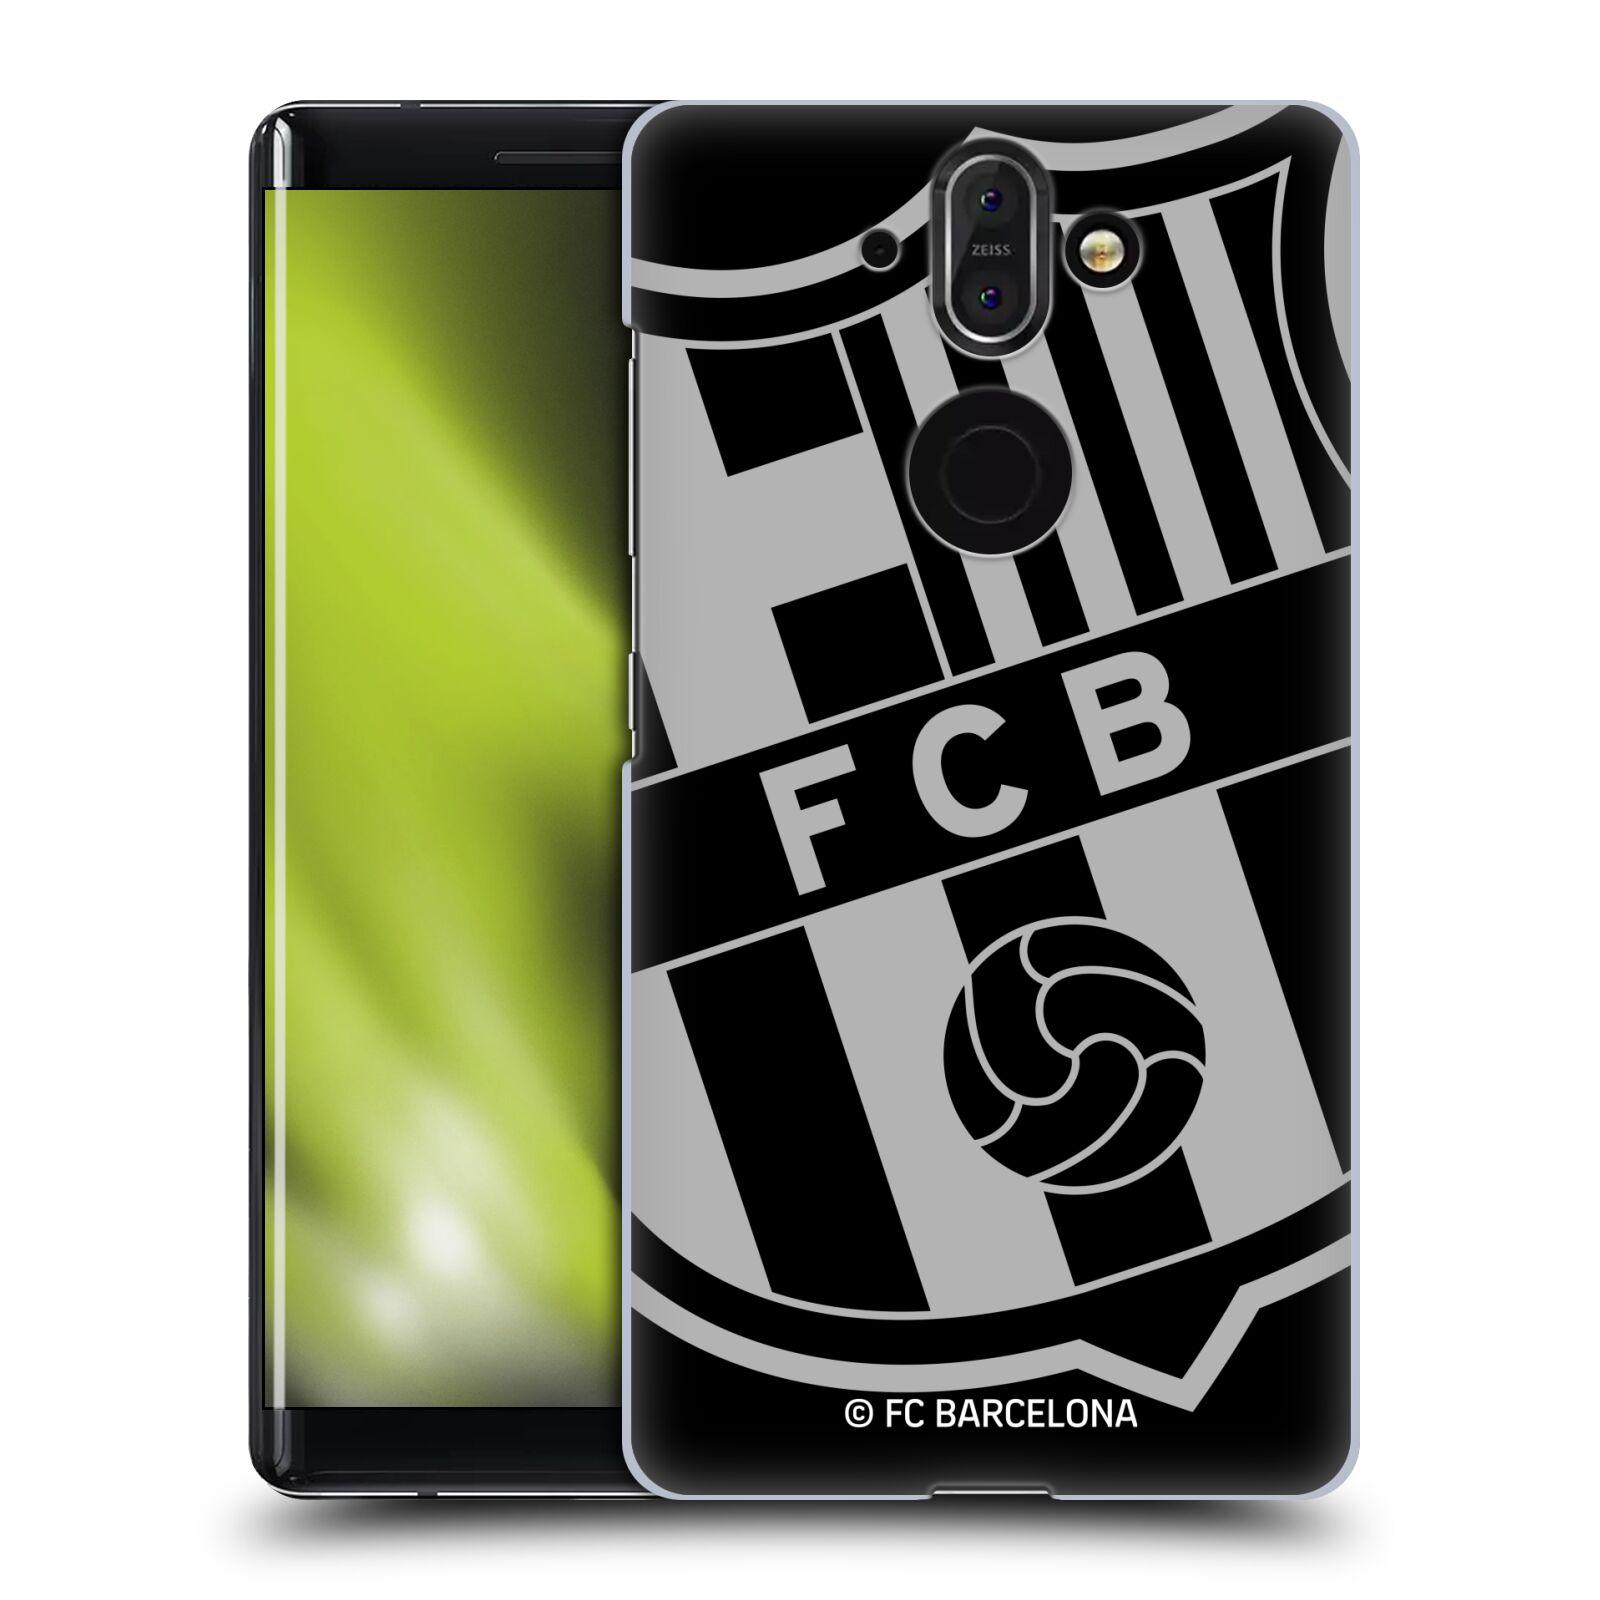 Plastové pouzdro na mobil Nokia 8 Sirocco - Head Case - FC Barcelona - Velké logo